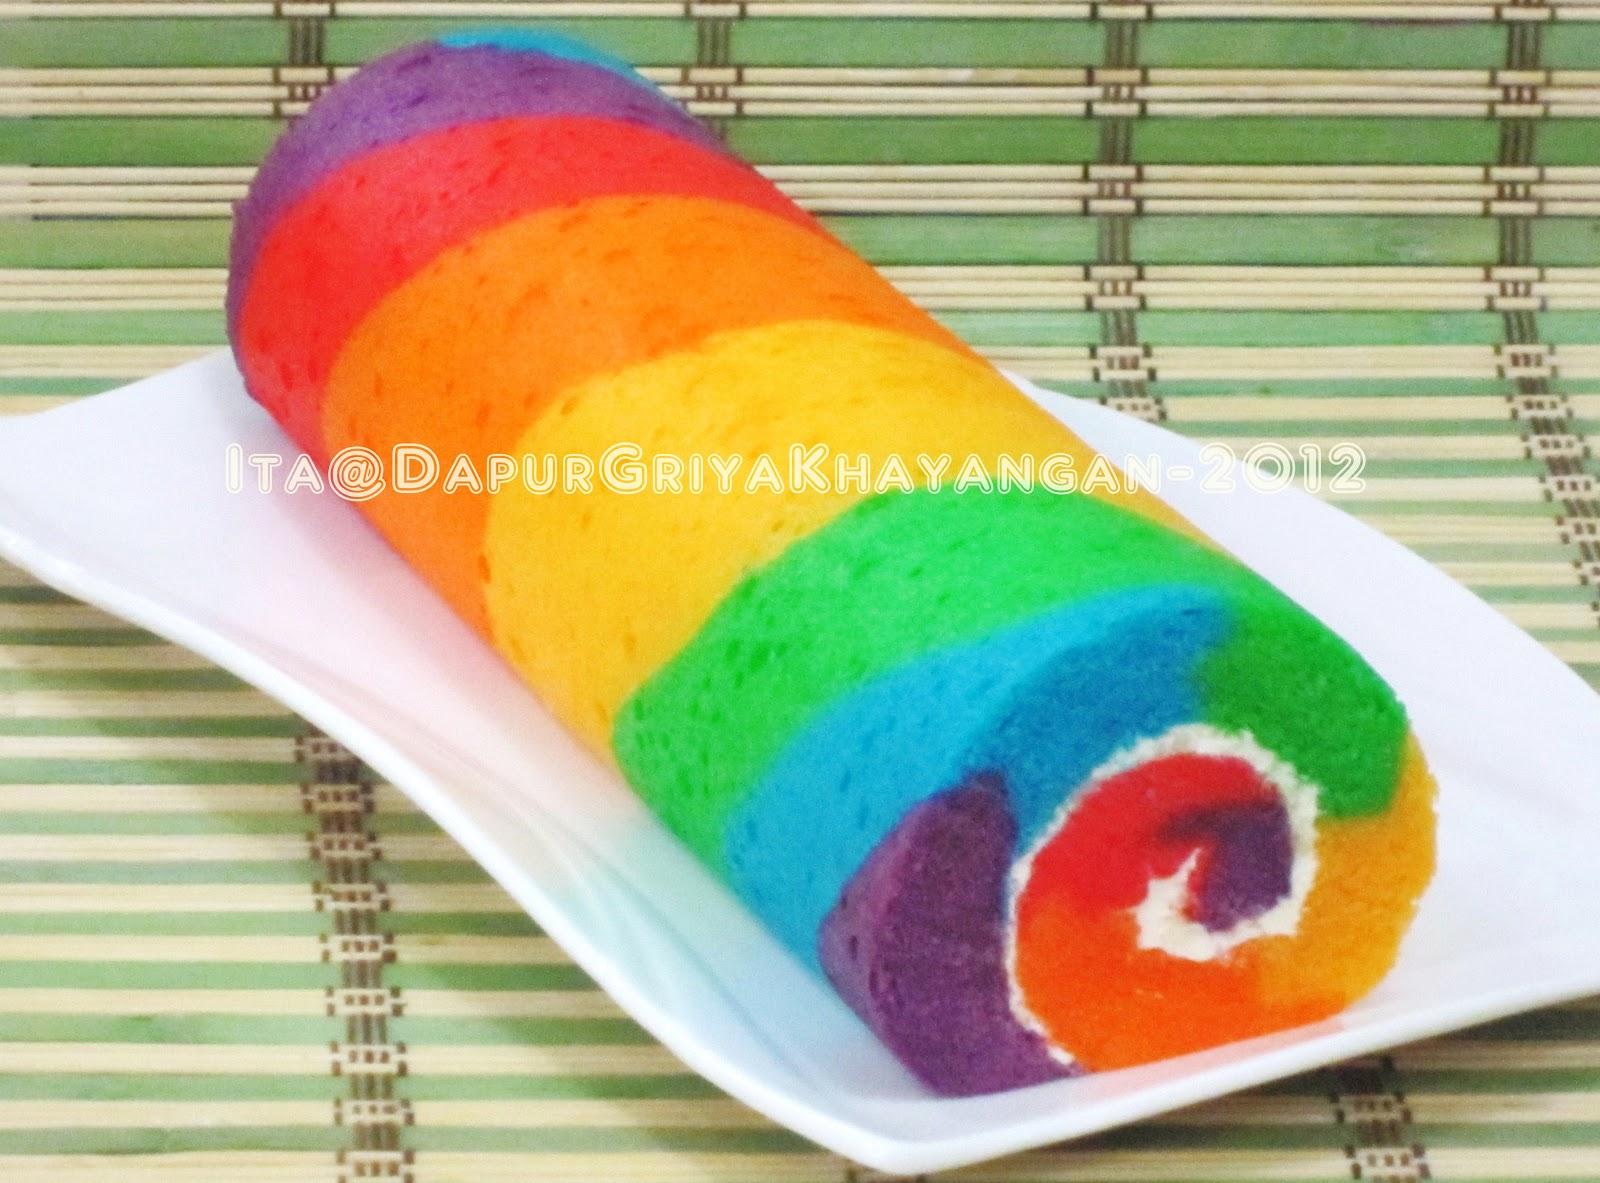 Resep Roll Cake Kukus Ekonomis: Dapur Griya Khayangan: Bolu Gulung Kukus Rainbow